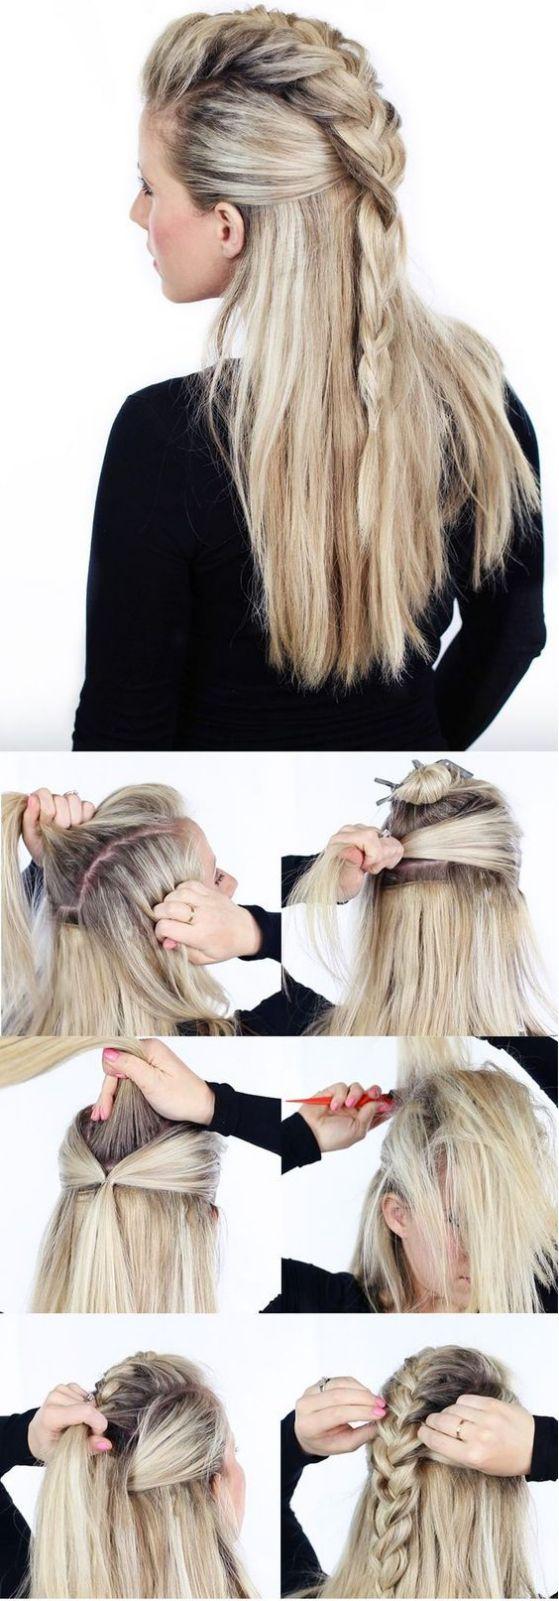 peinaod para cabello largo trenzado